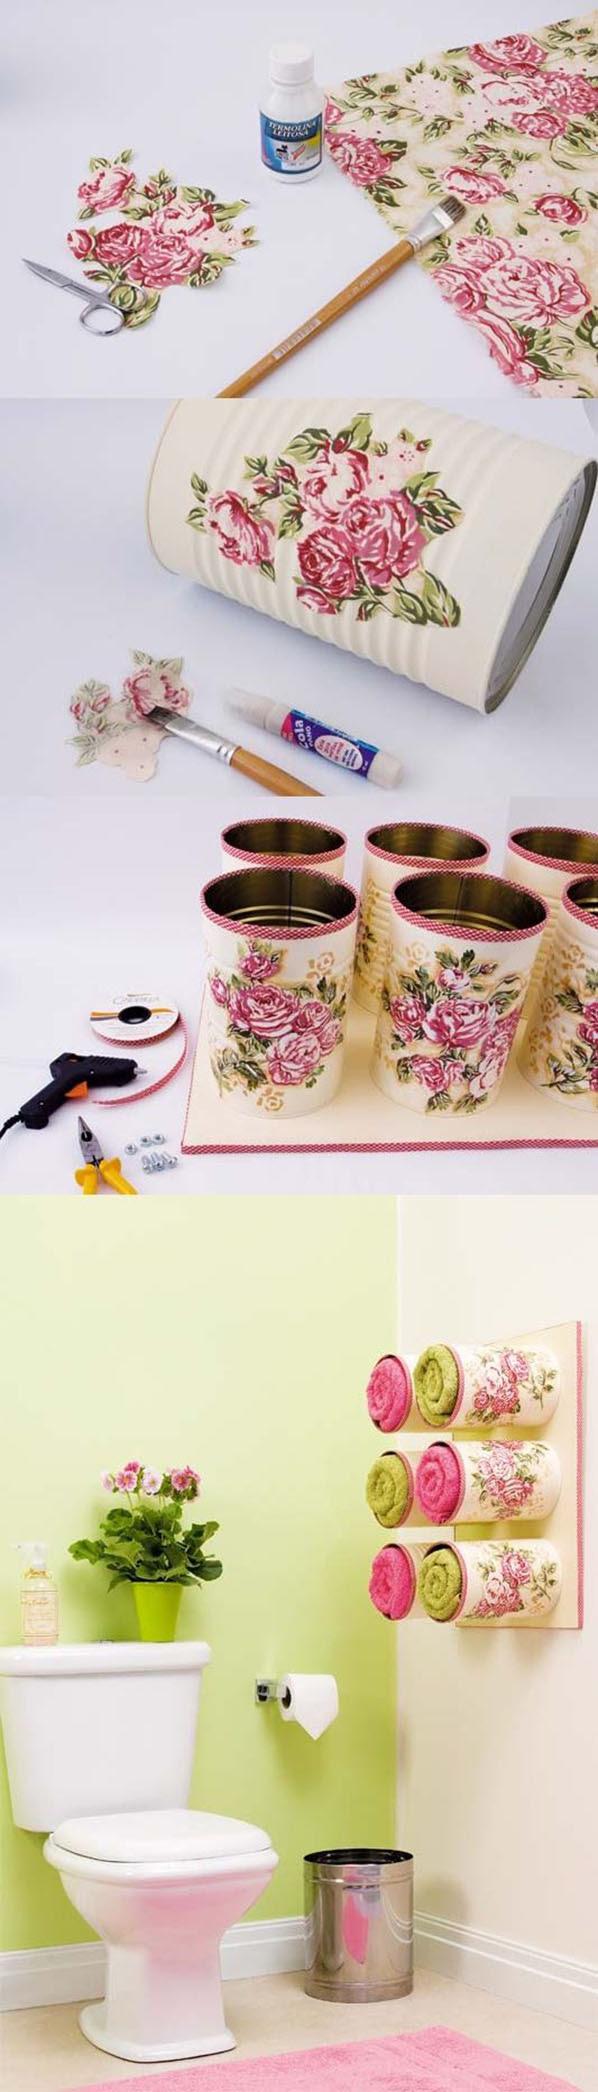 Toallero hecho de latas de conserva